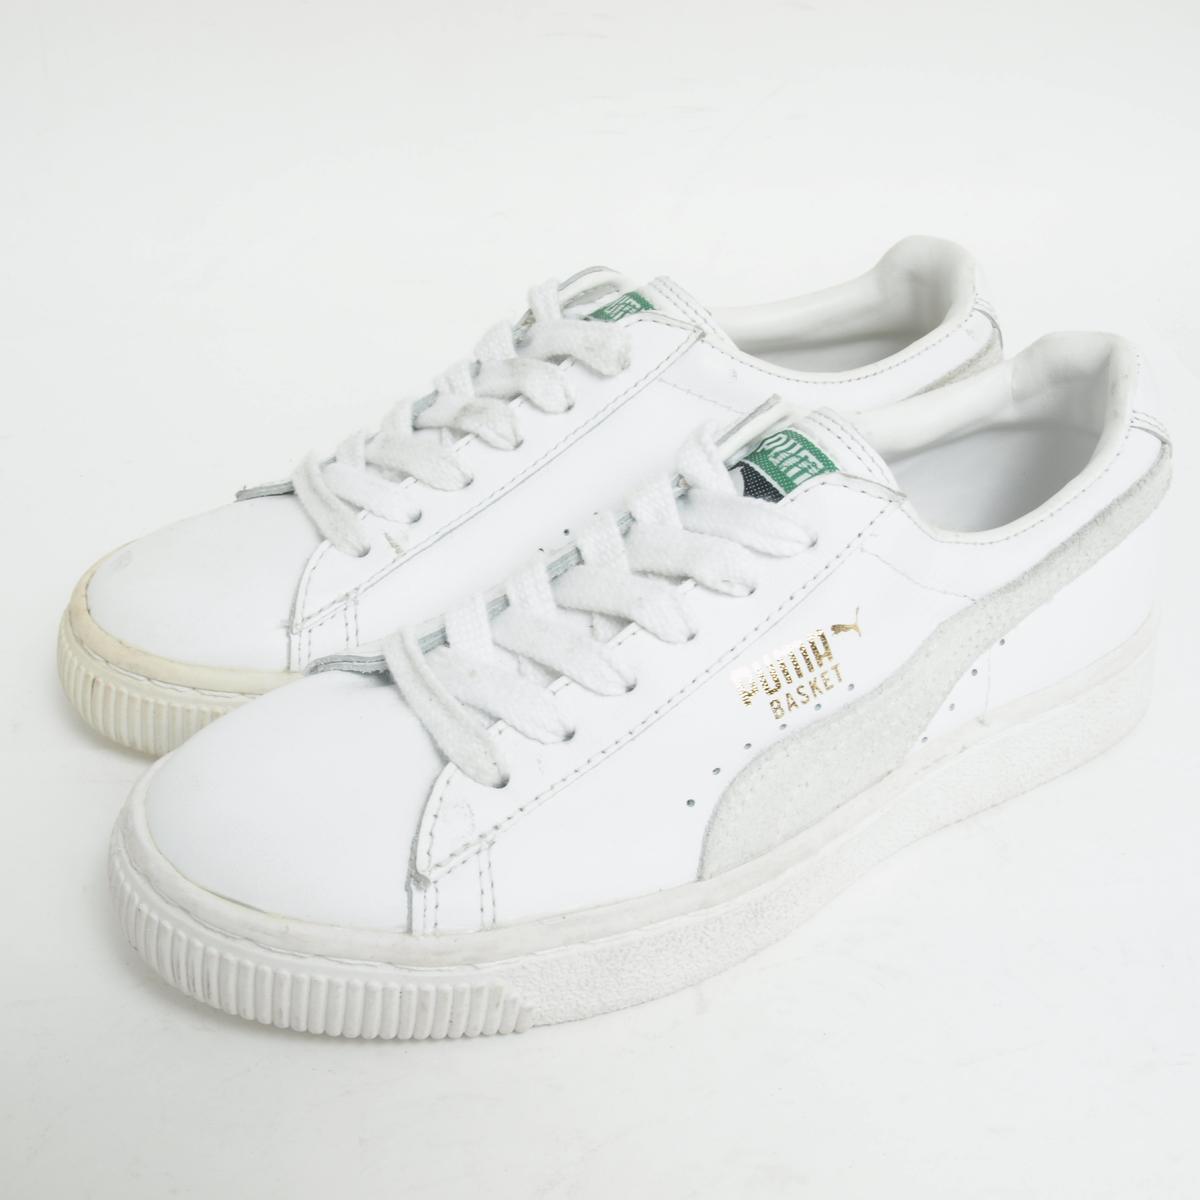 c25cc1433314 VINTAGE CLOTHING JAM  90s dead stock Puma PUMA BASKET sneakers US3.5 ...